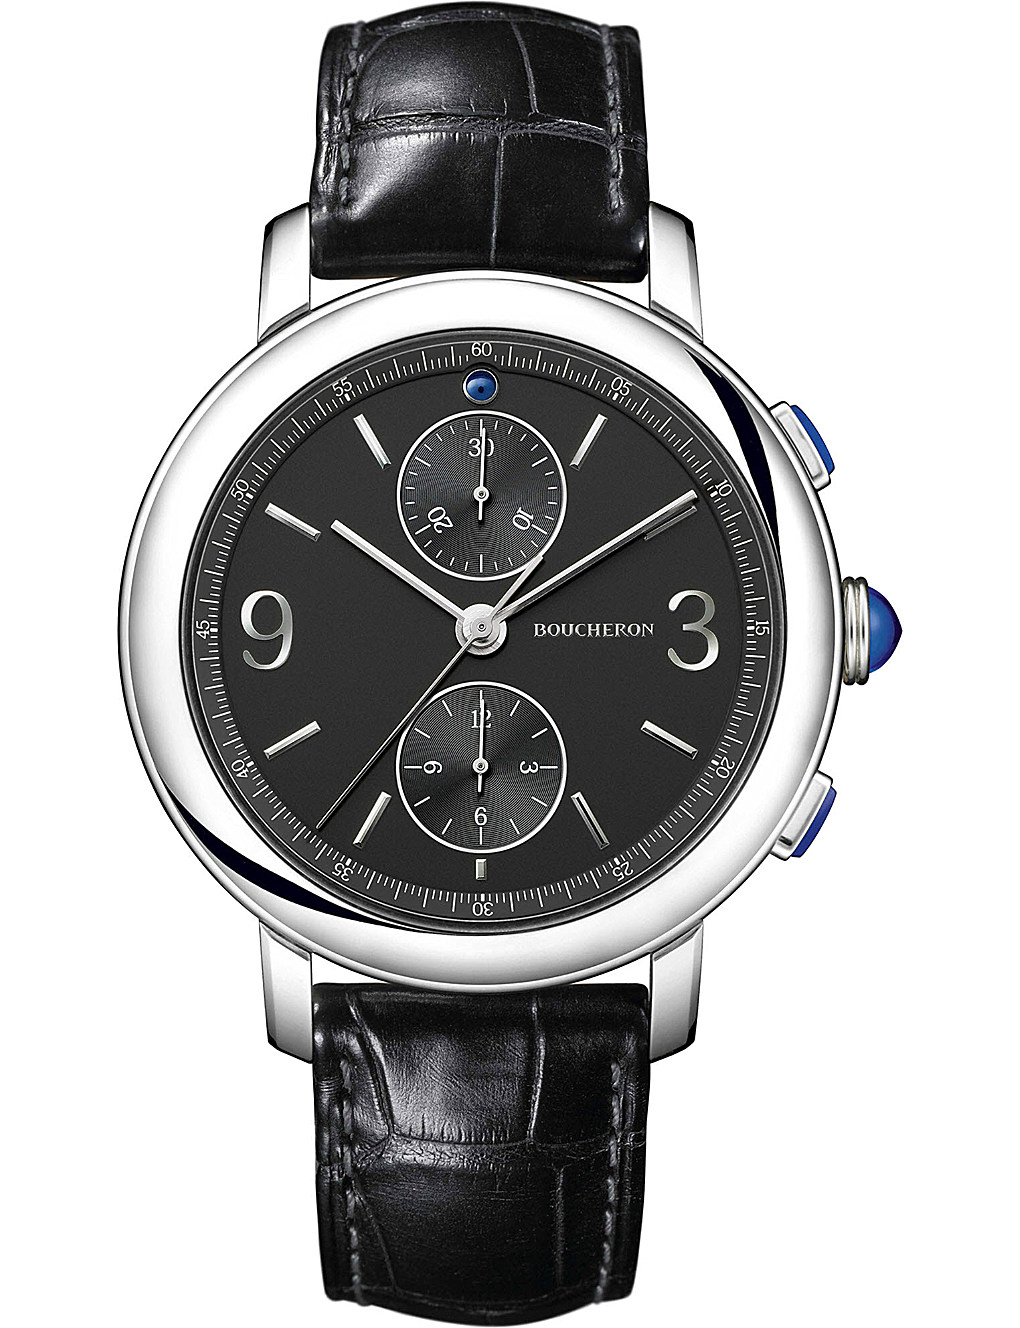 epure-watch-steel-chronograph